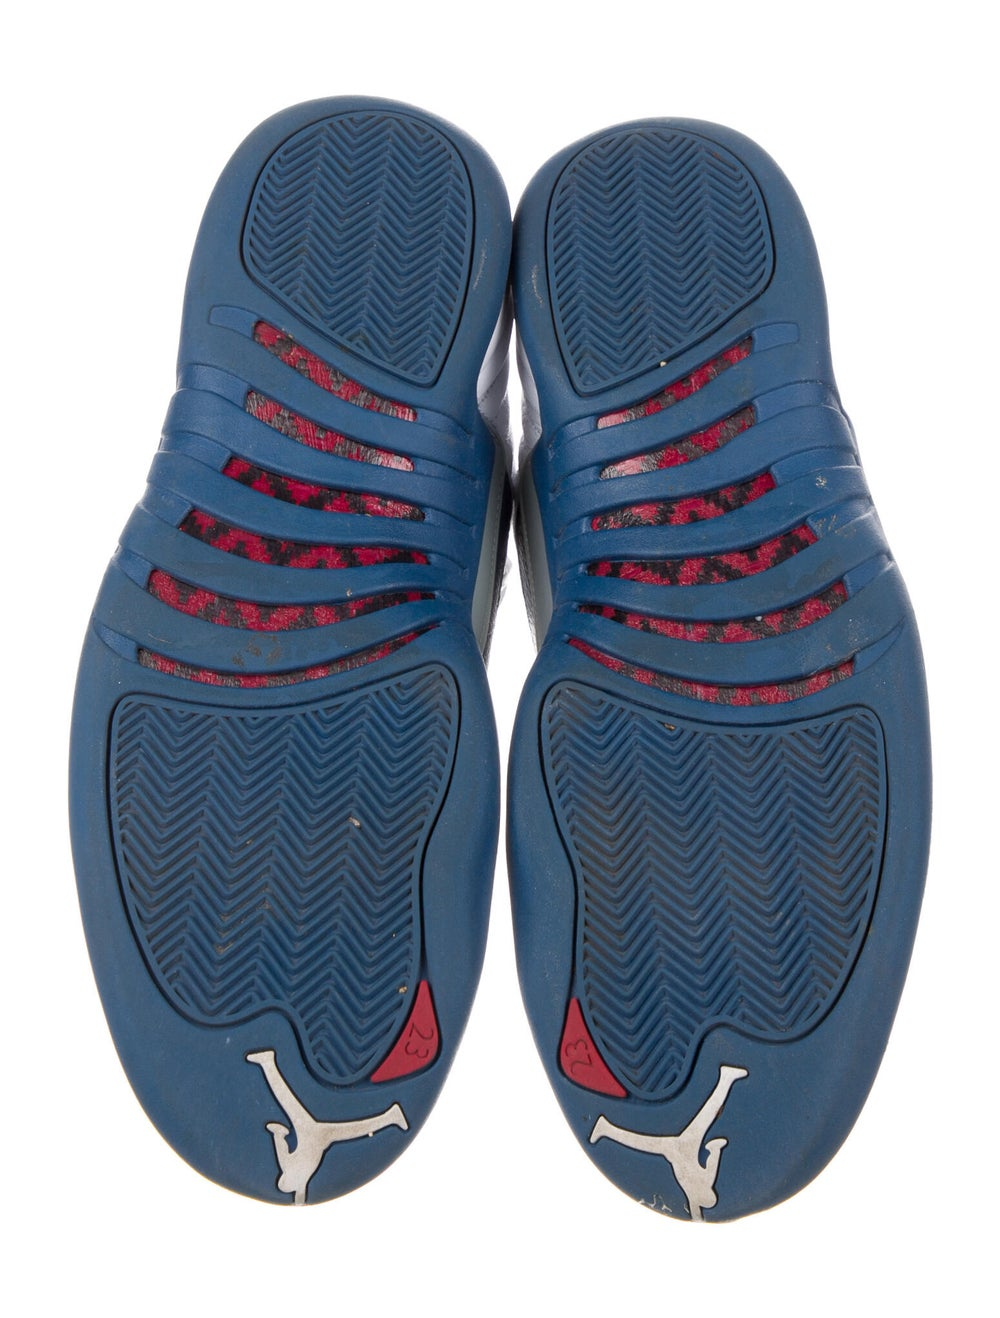 Jordan Jordan 12 Retro French Blue Sneakers Blue - image 5